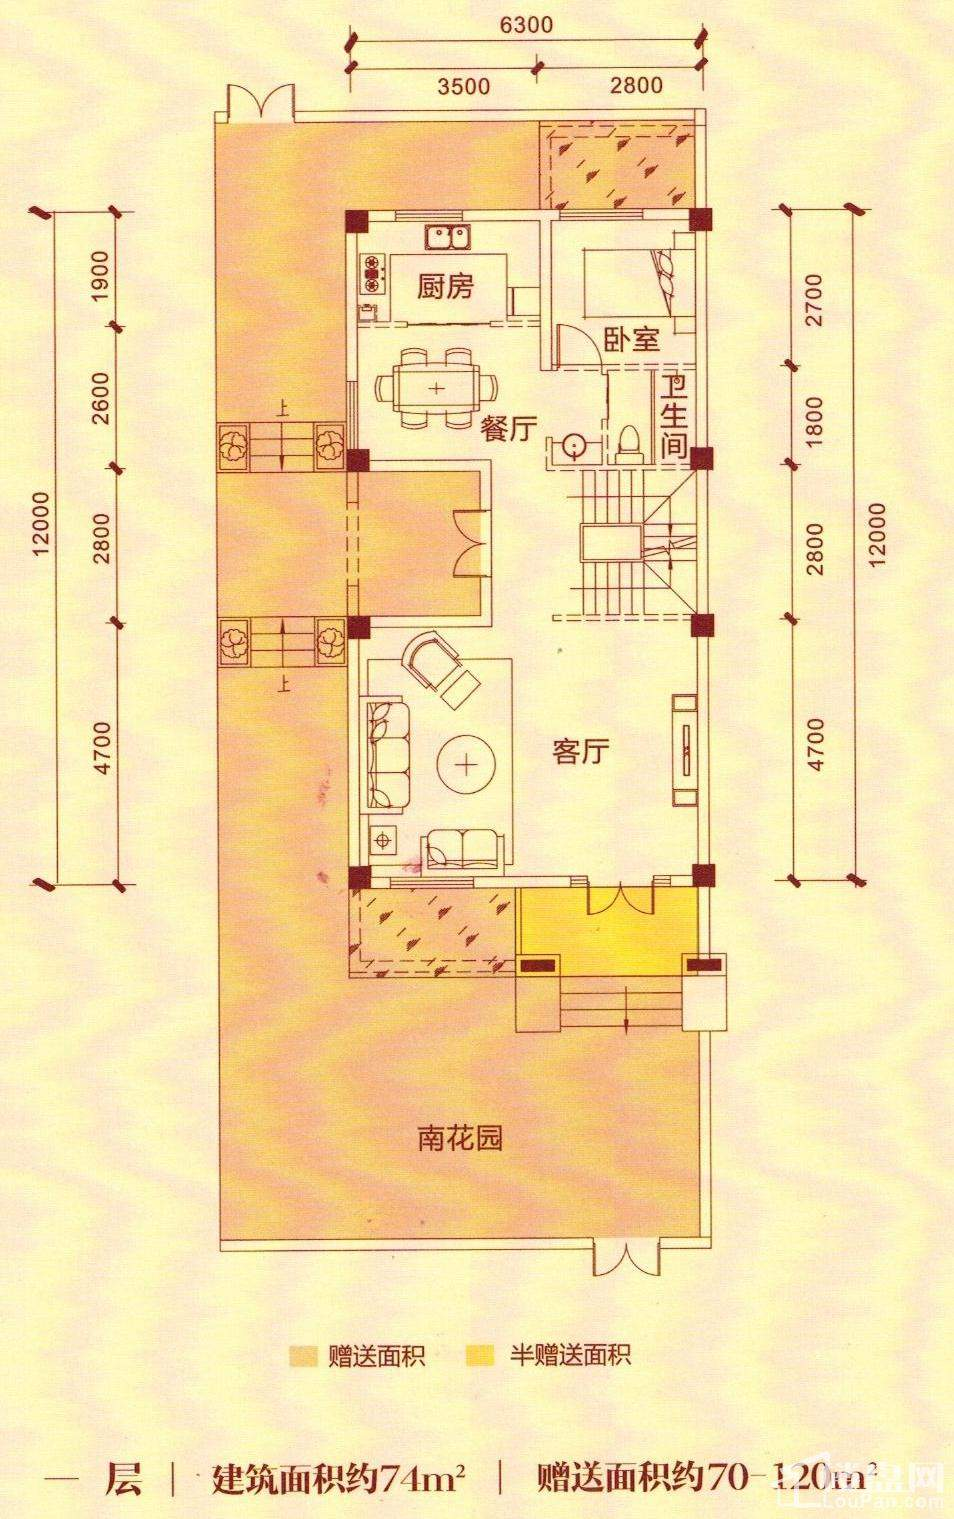 ap3970p7-g1 电路图